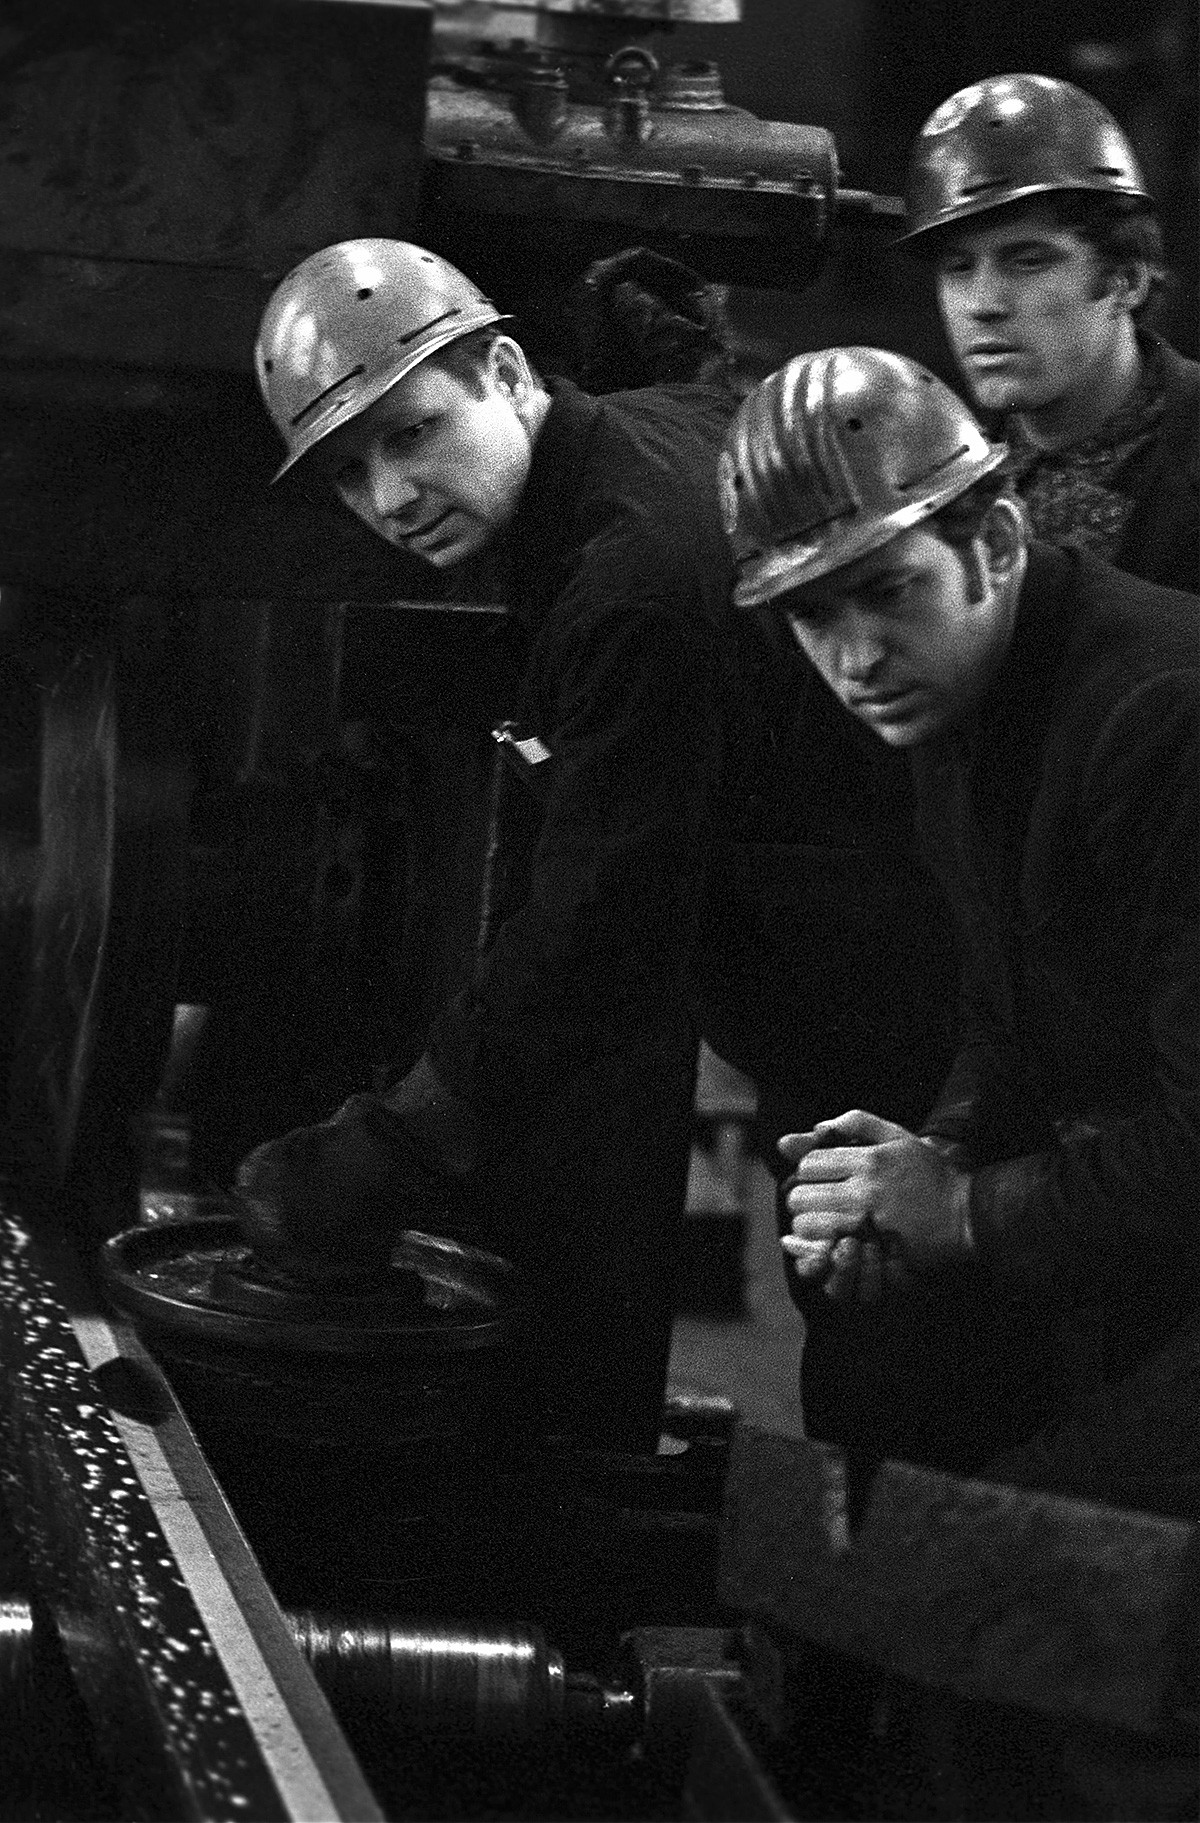 Zaporozhstal Metallurgical Plant, 1974